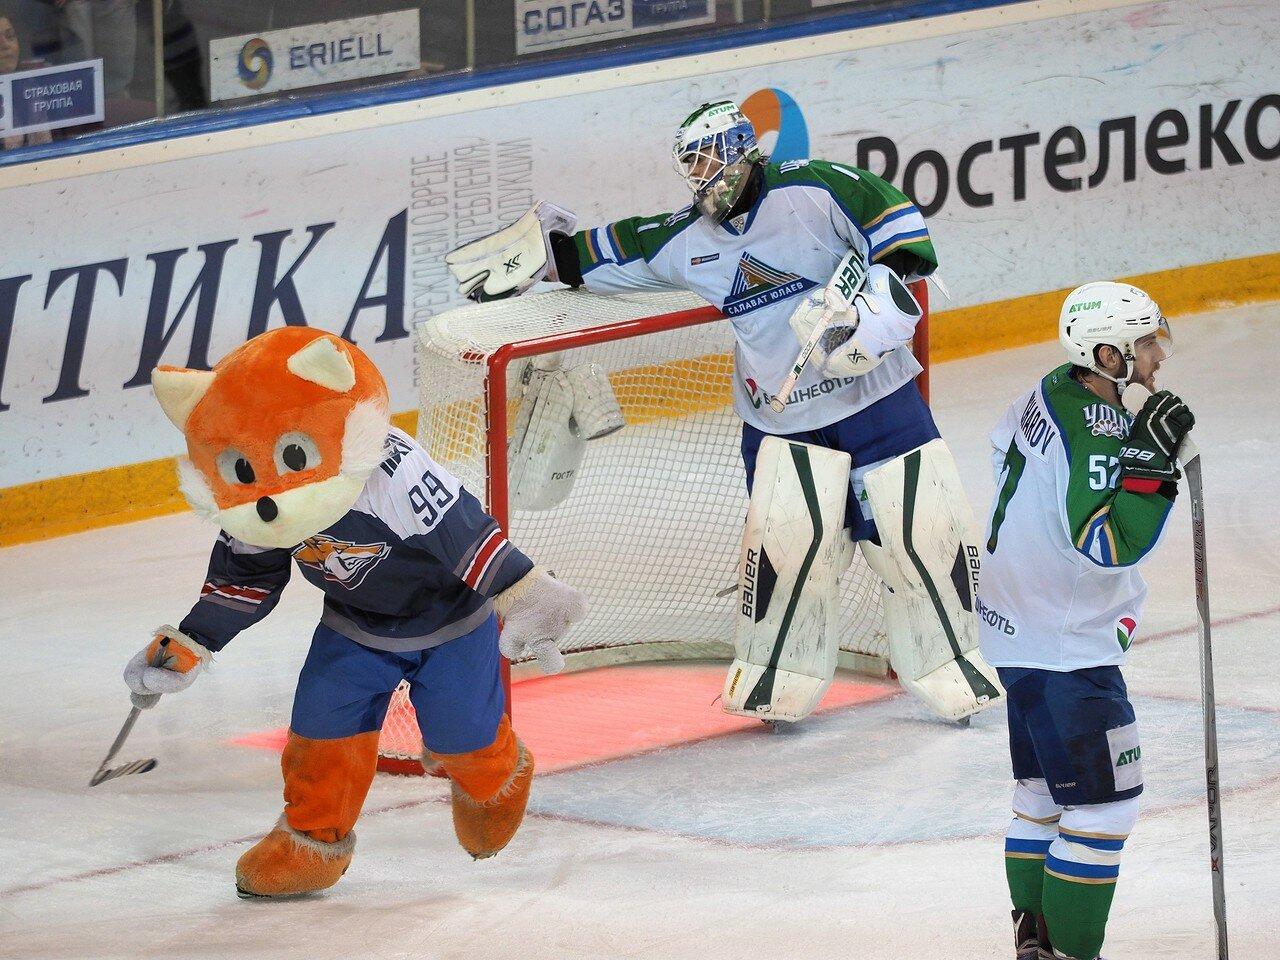 147Плей-офф 2016 Восток Финал Металлург - Салават Юлаев 23.03.2016